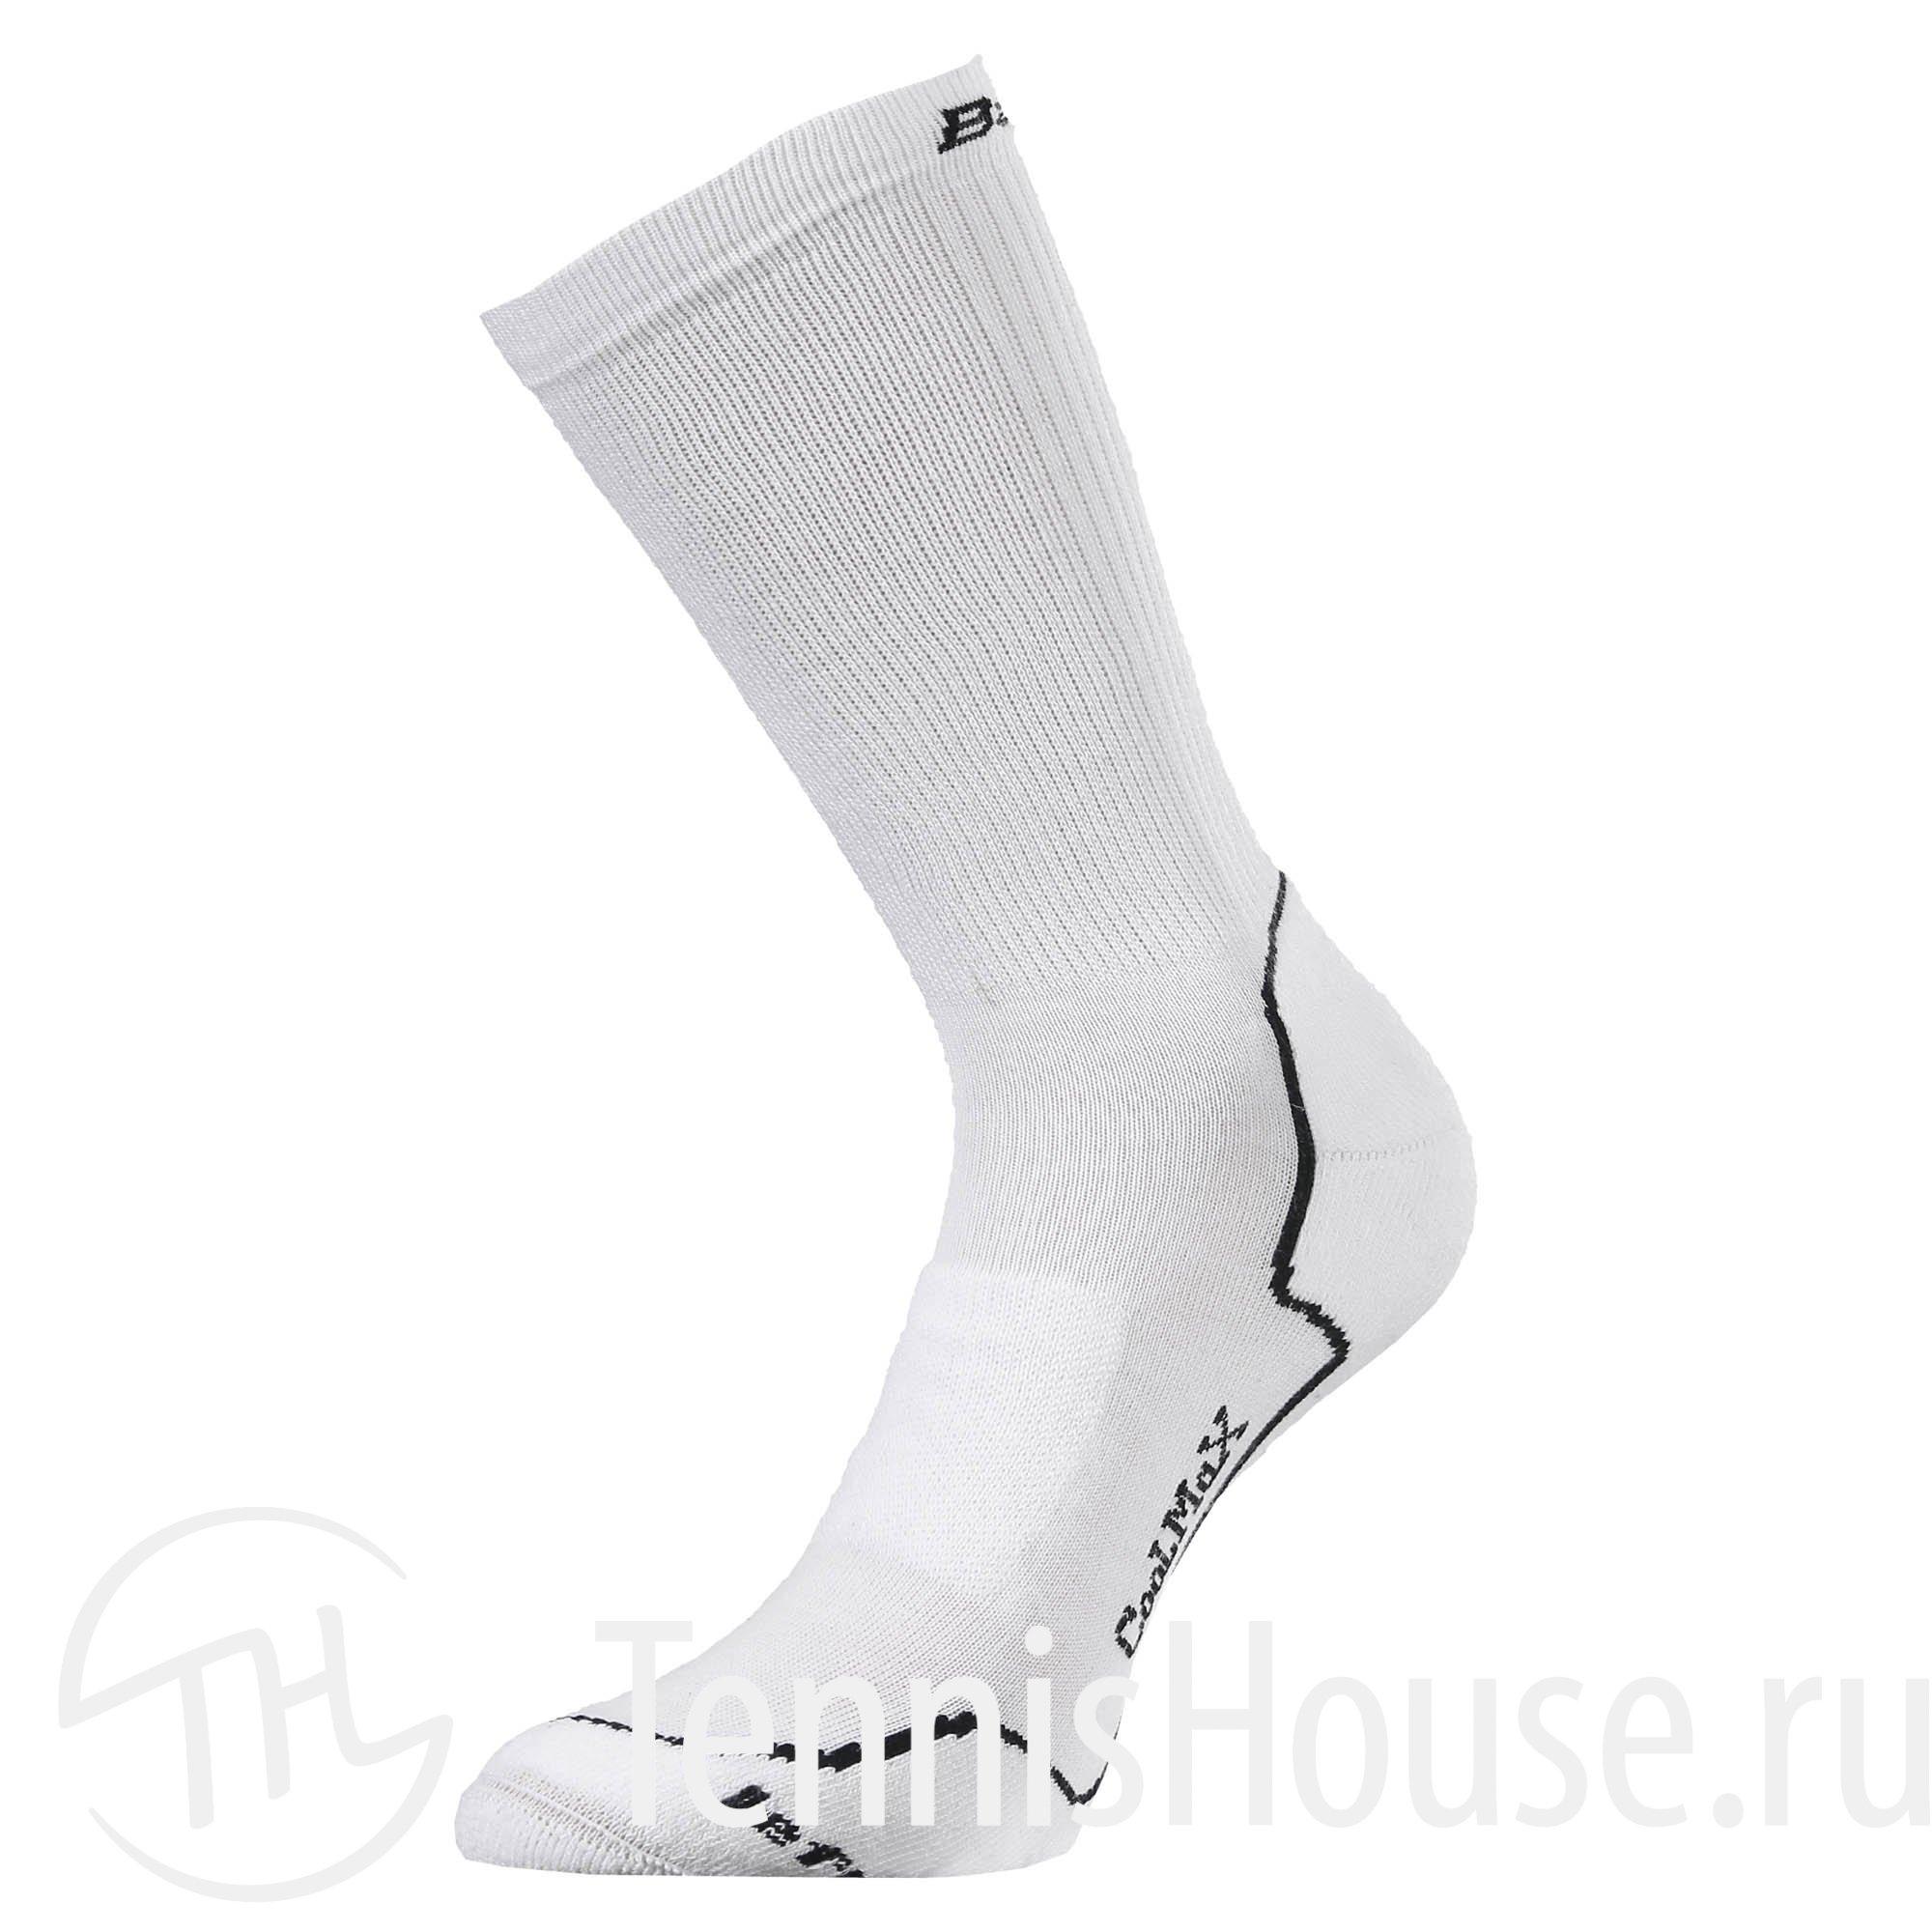 Мужские носки 1 пара Babolat Team 45S1392